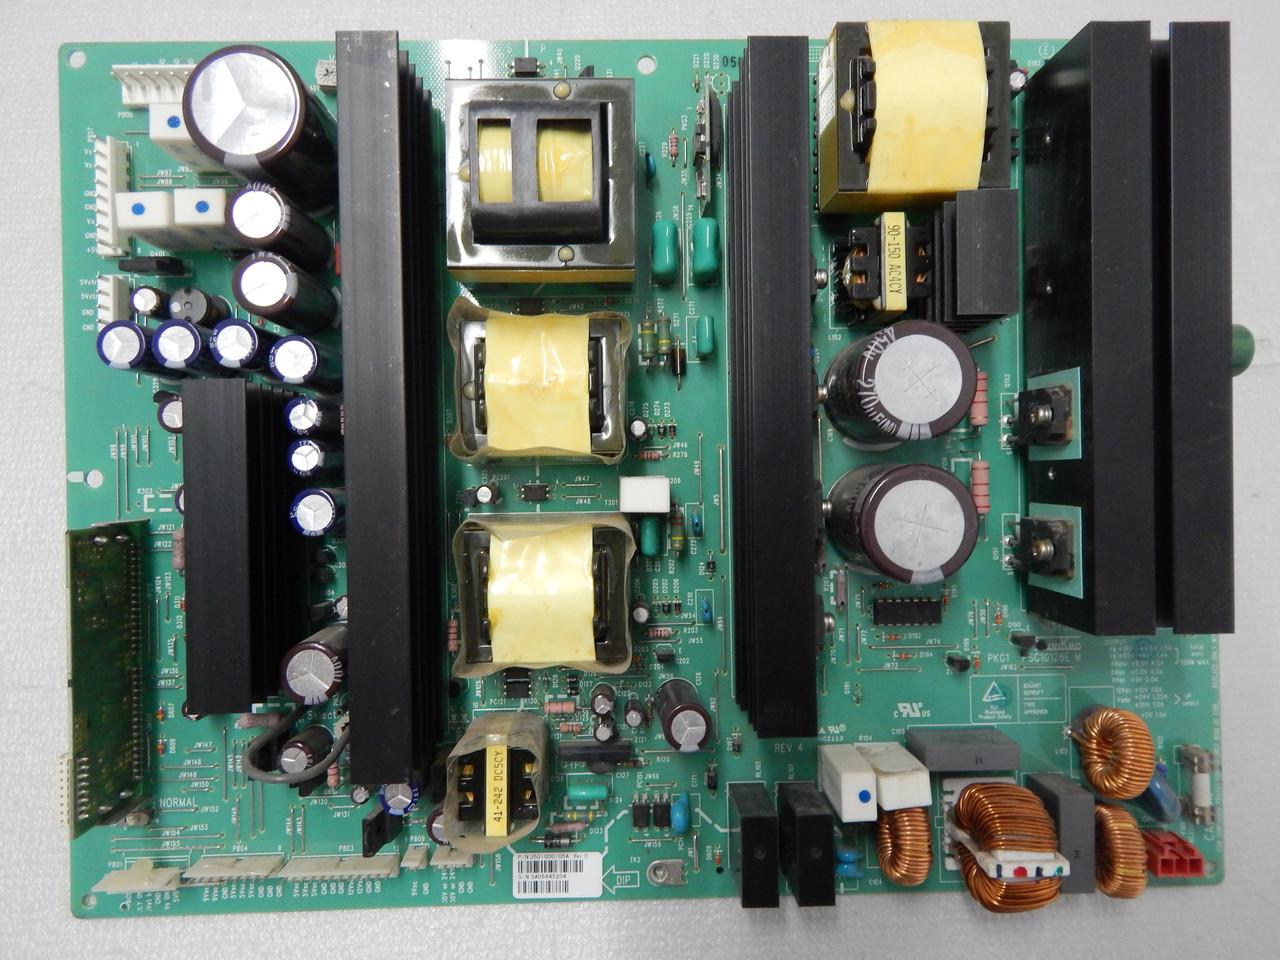 Power Supply 3501Q00105A PSC10126E для телевизора Dual dptv 4210,LGV7